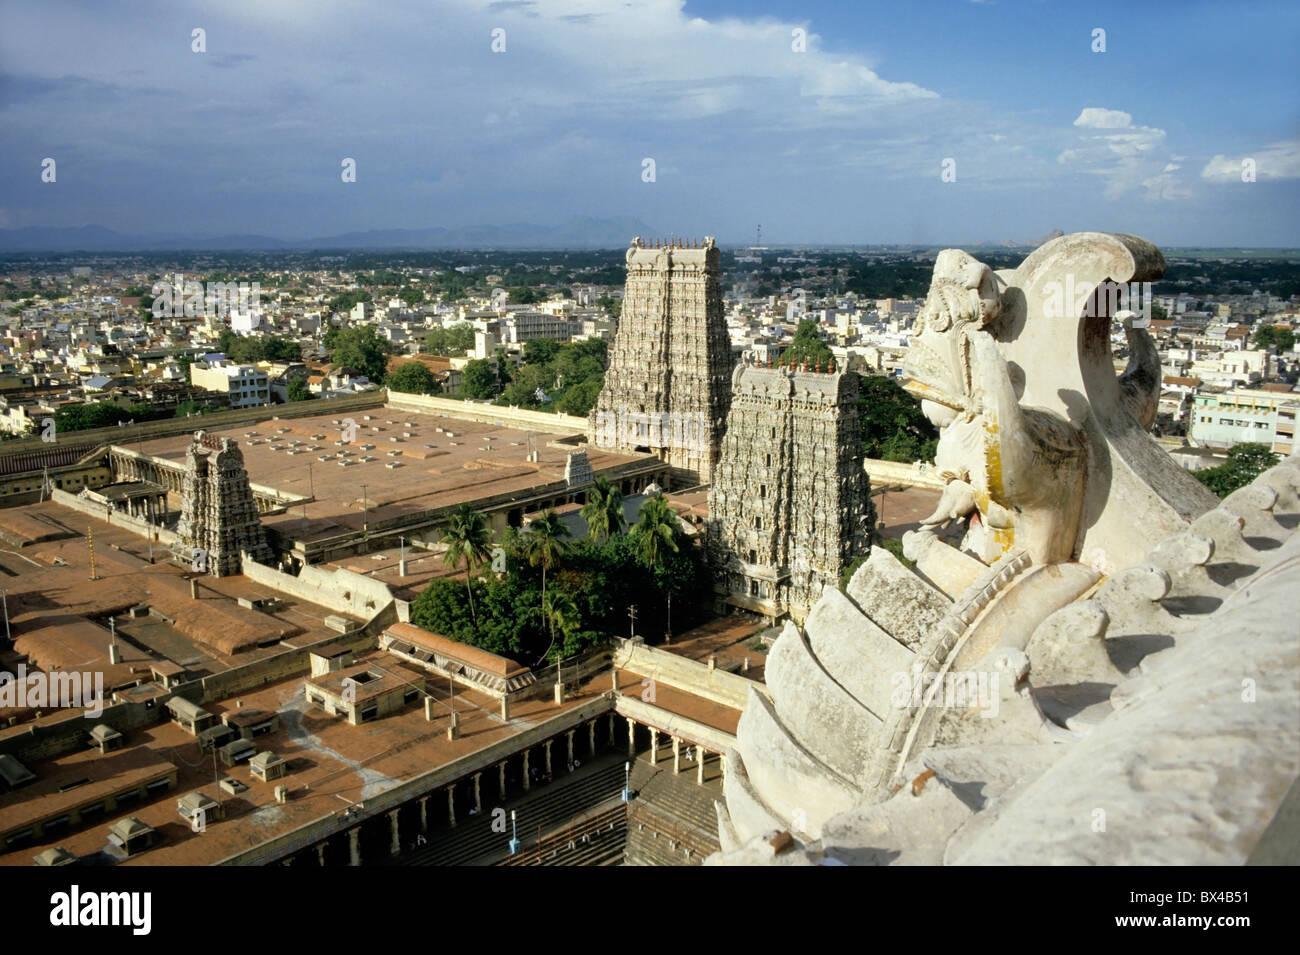 India - Madurai Sundareswarar Tempio di Madurai noto anche come Madurai Amman Tempio di Madurai Immagini Stock